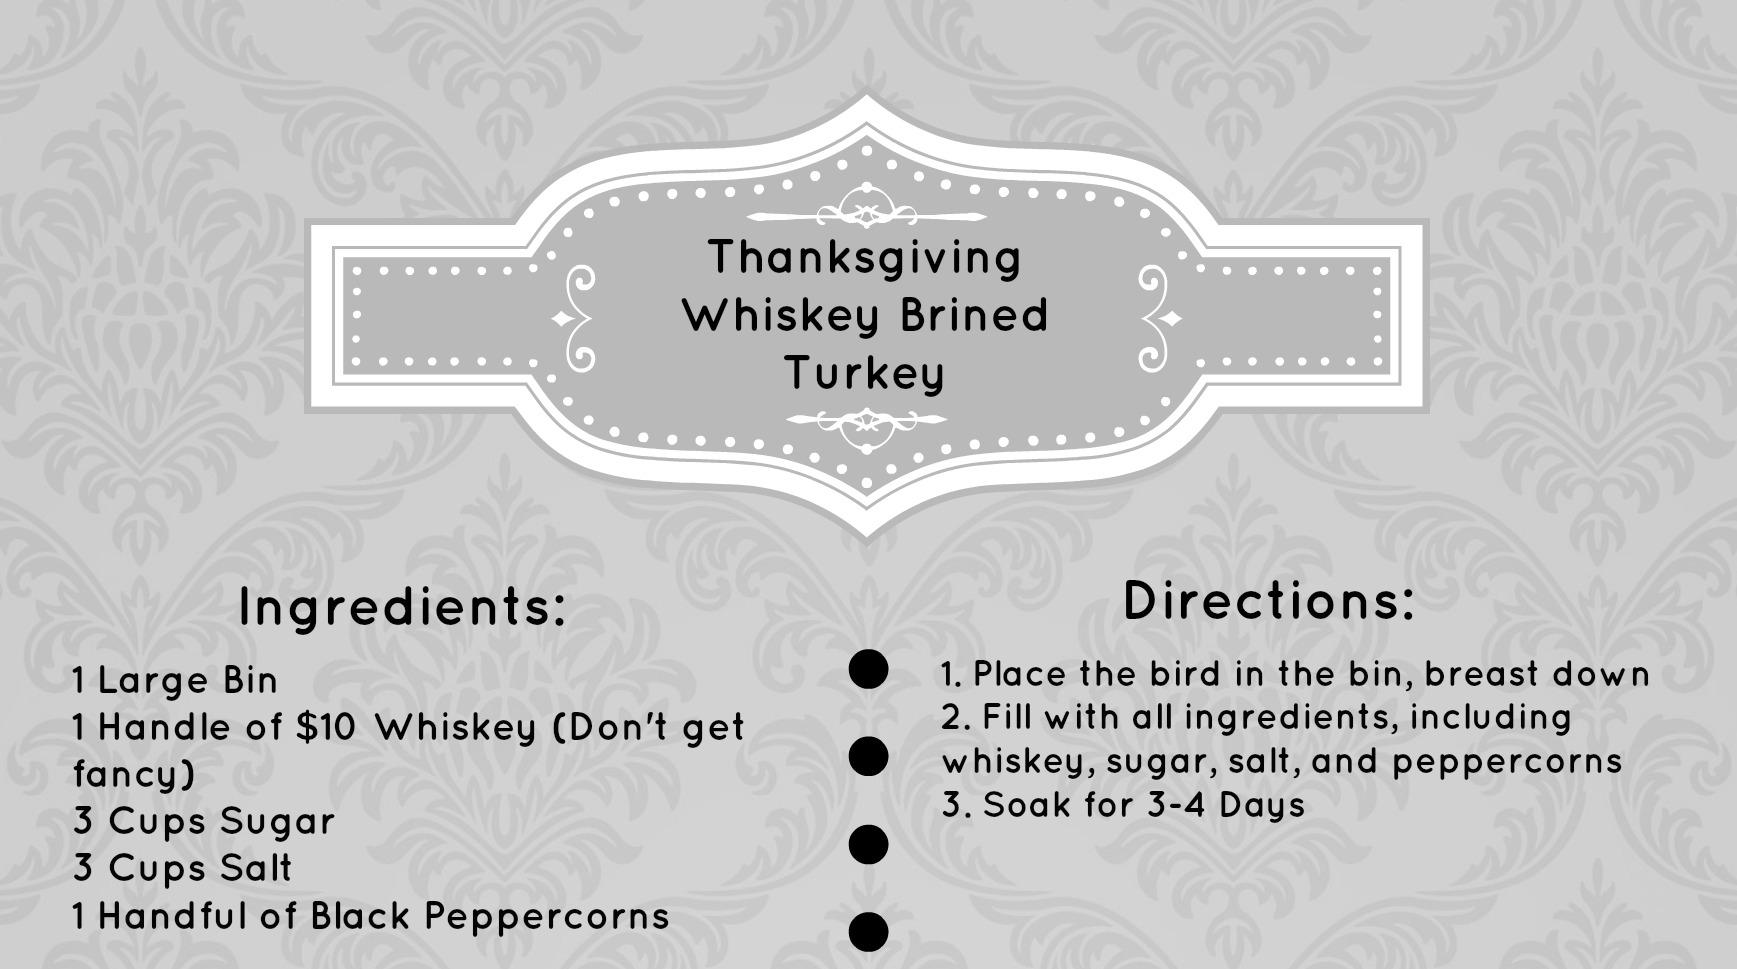 Thankgiving Whiskey Brined Turkey